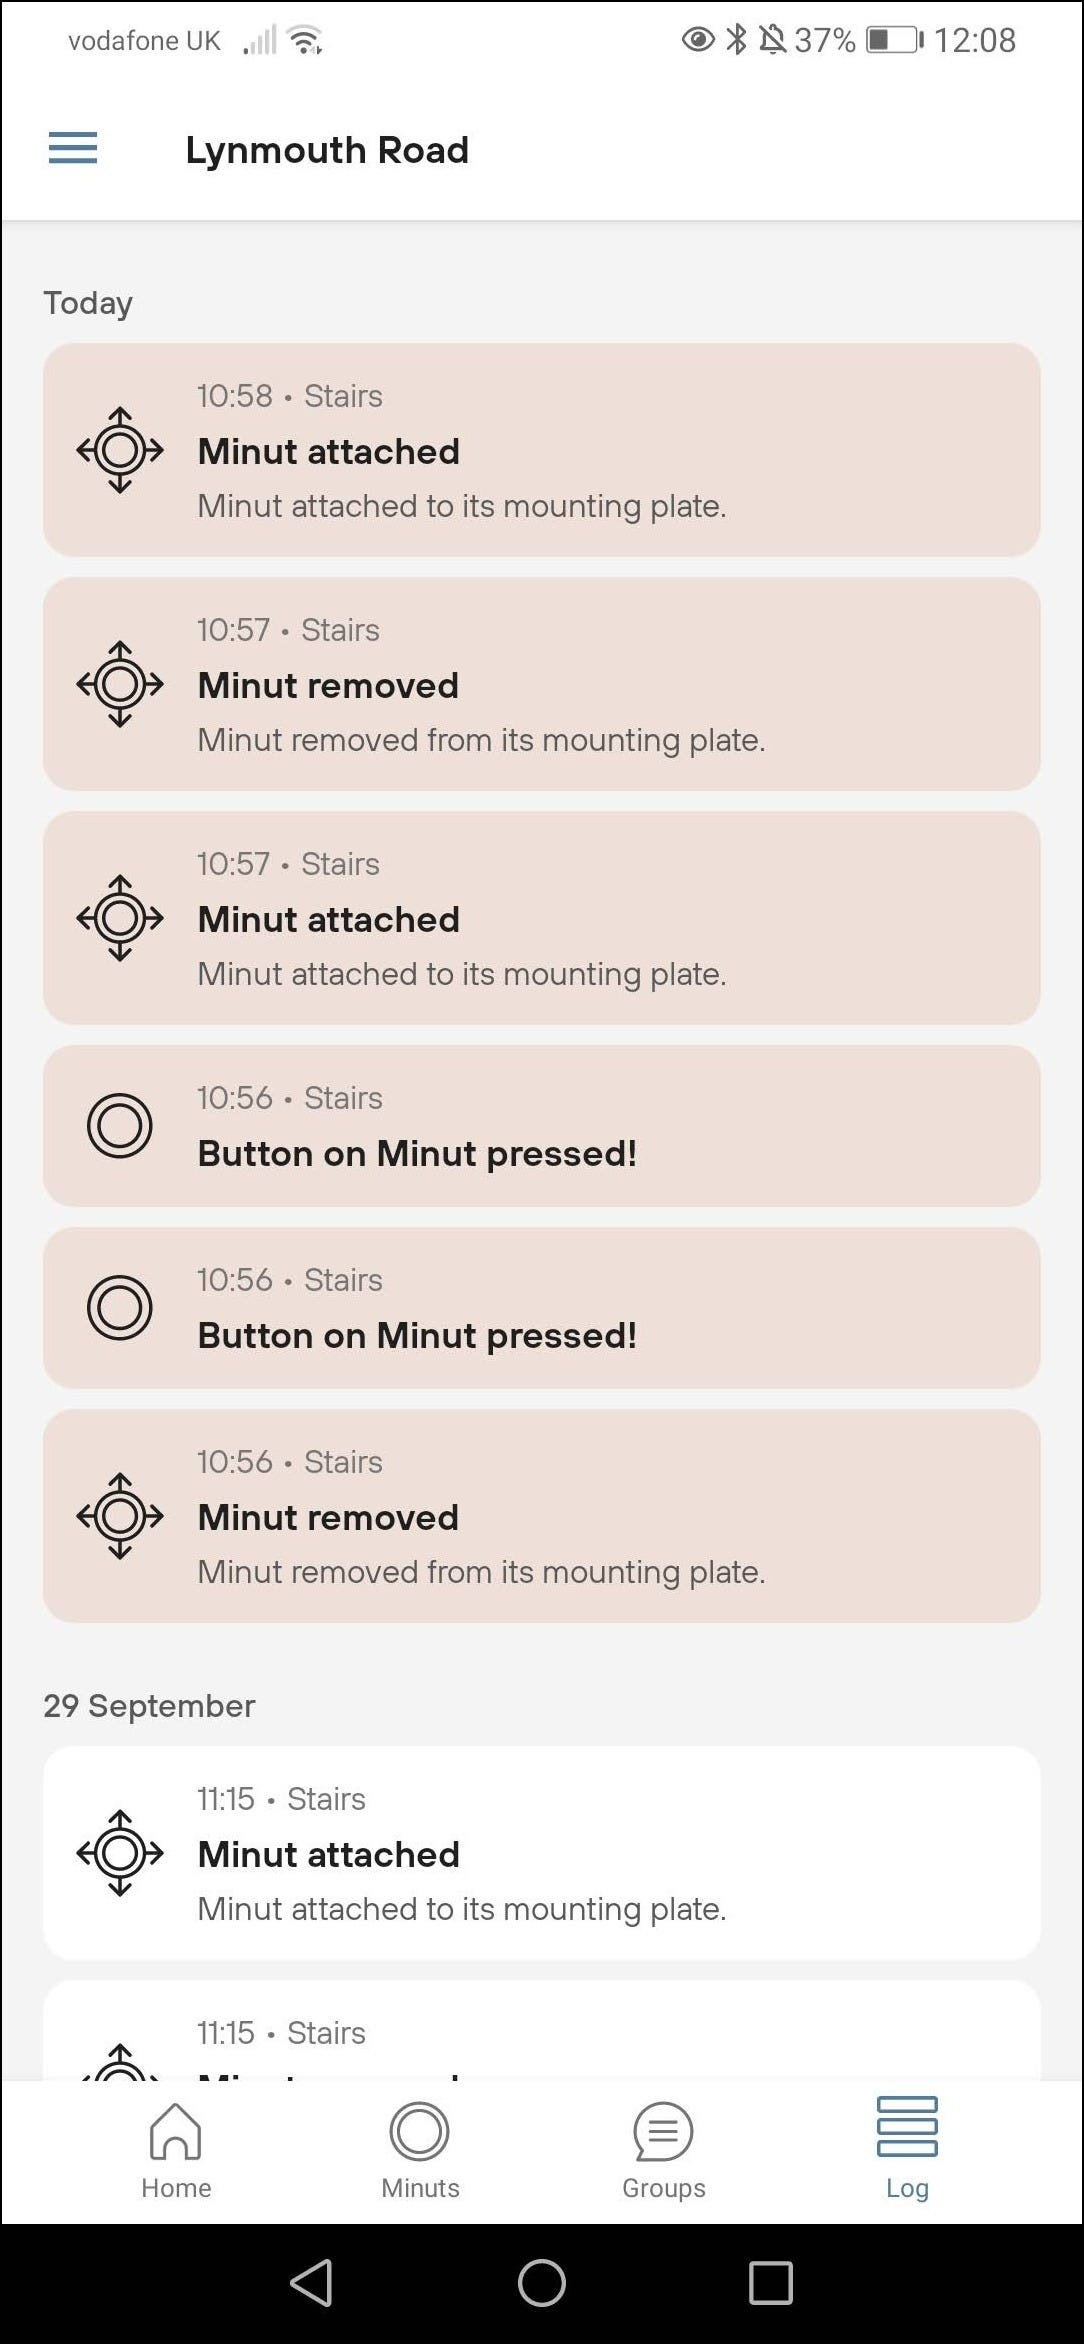 minut message log page